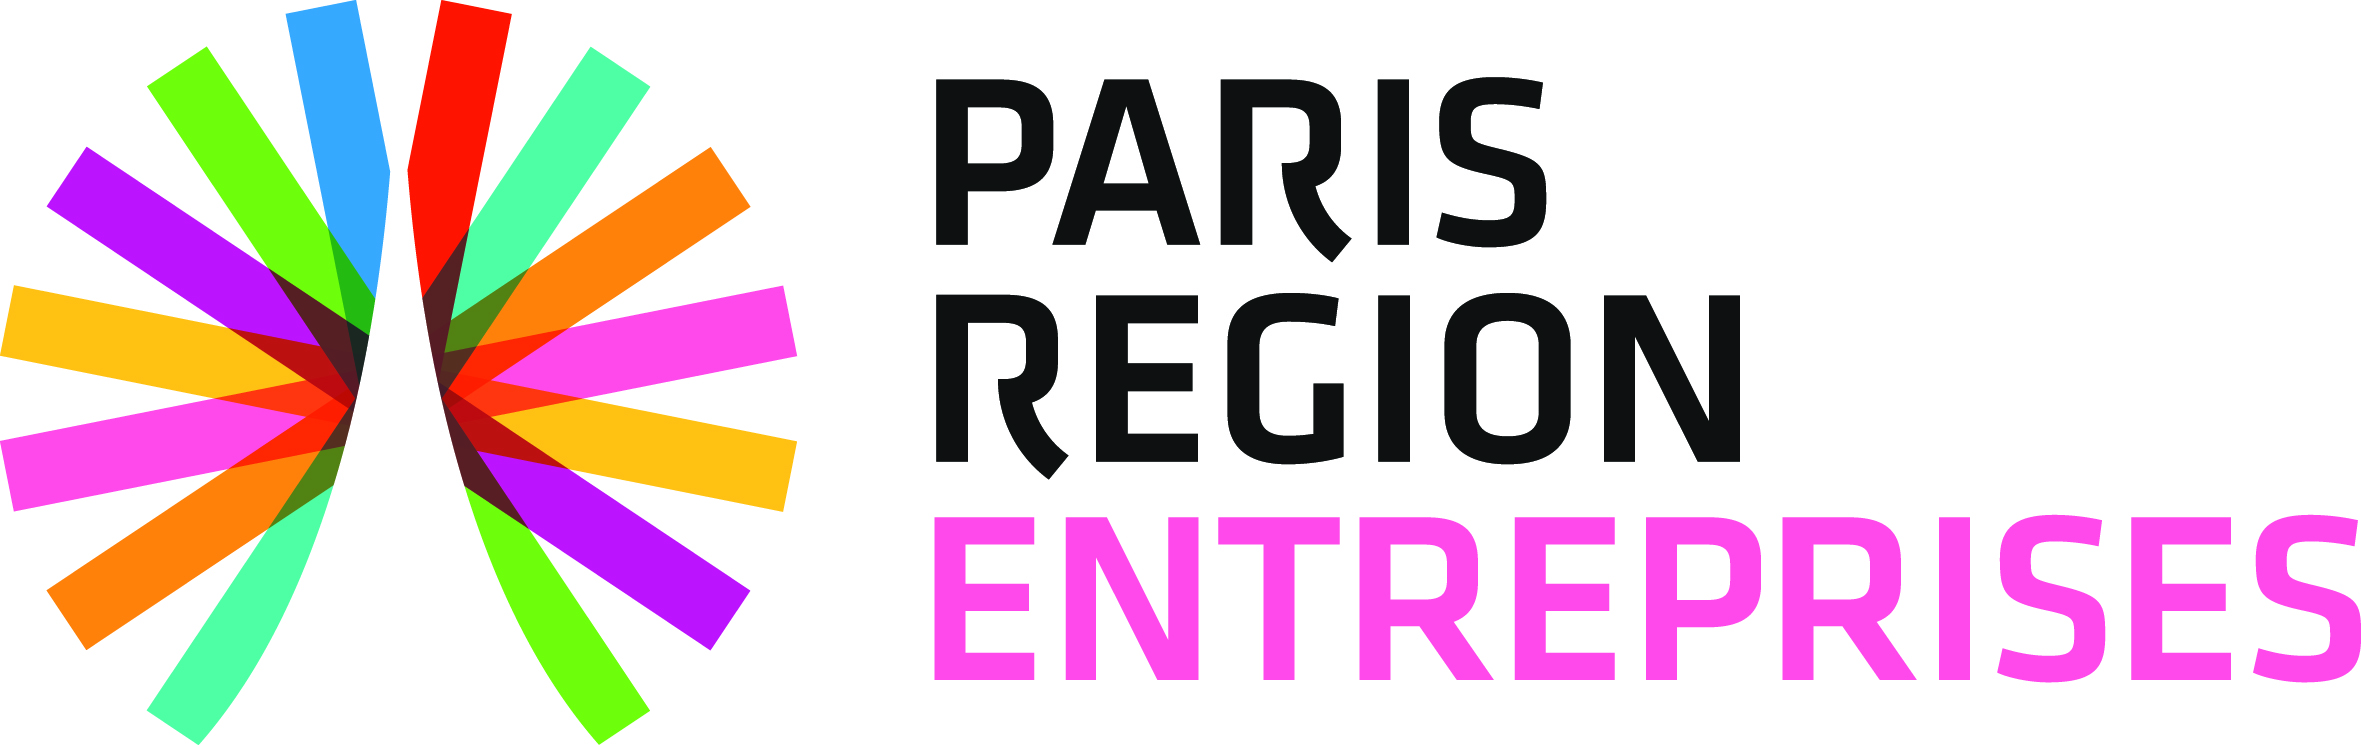 Paris Region Entreprises is organizing a TechMeeting in Paris on Smart Transportation